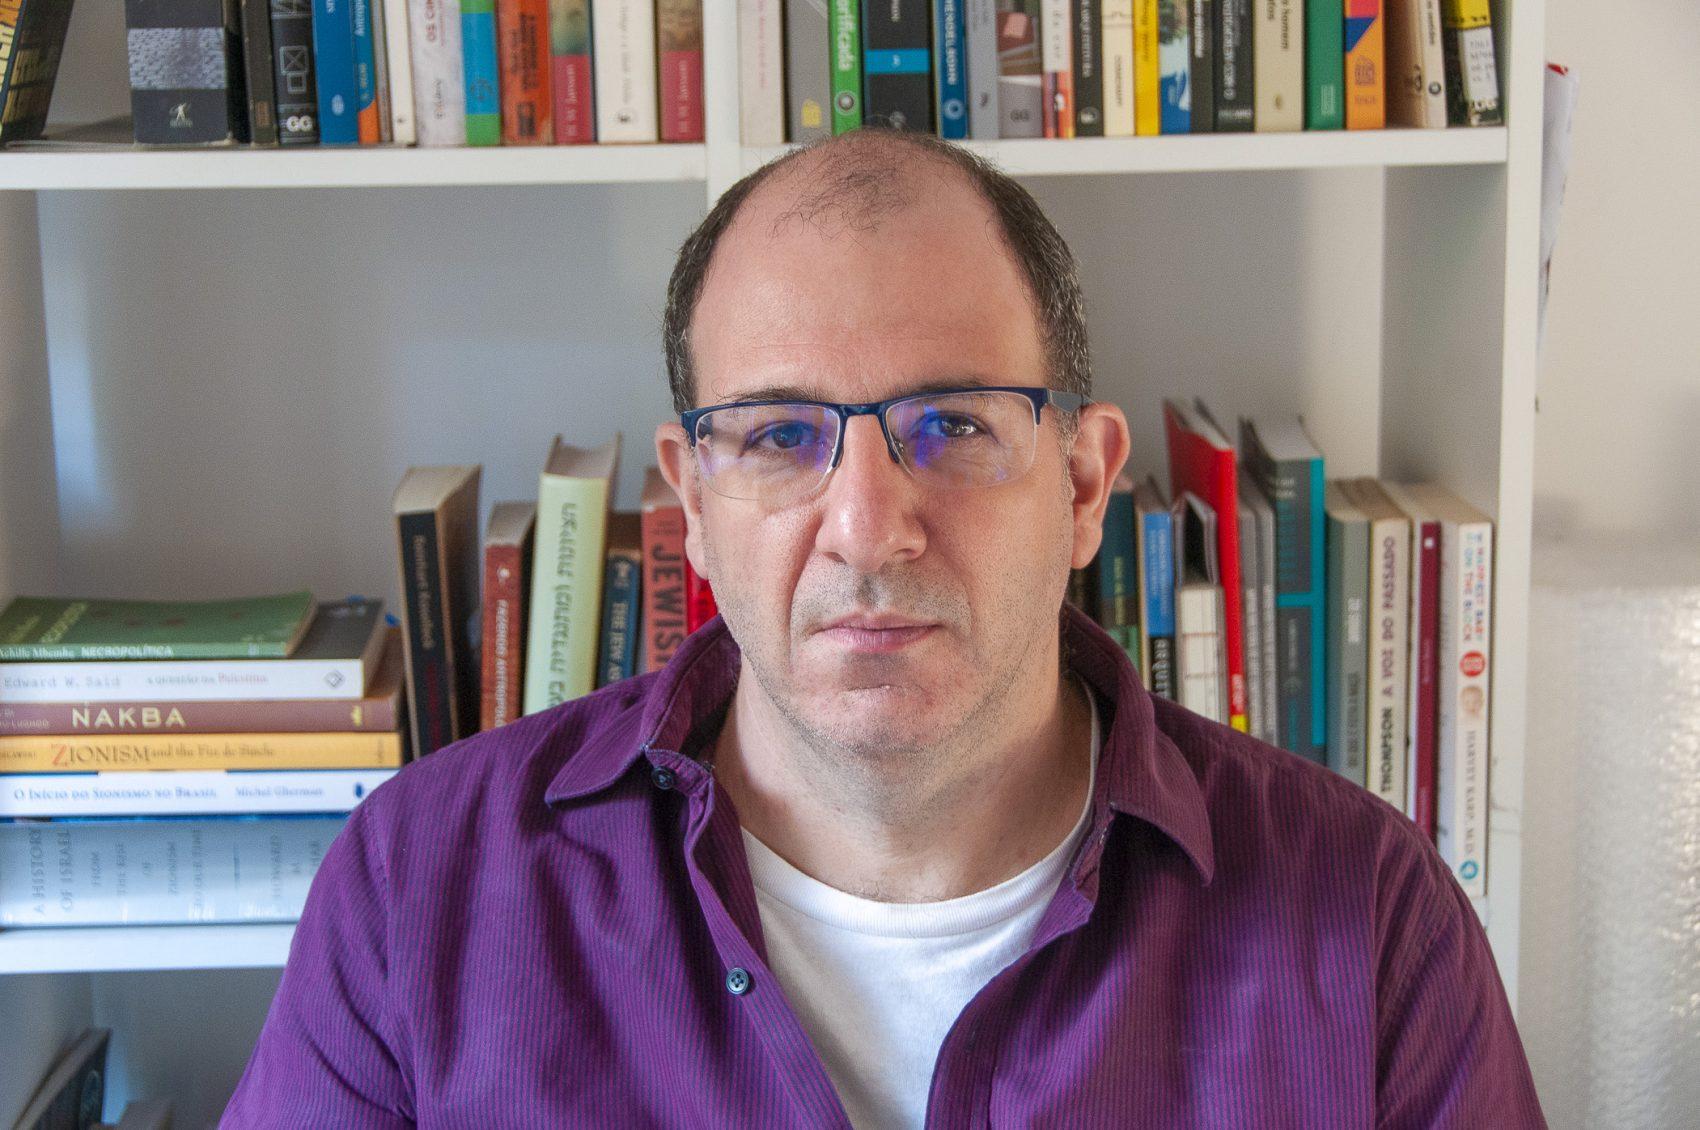 O bolsonarismo é nazifascista, diz historiador judeu